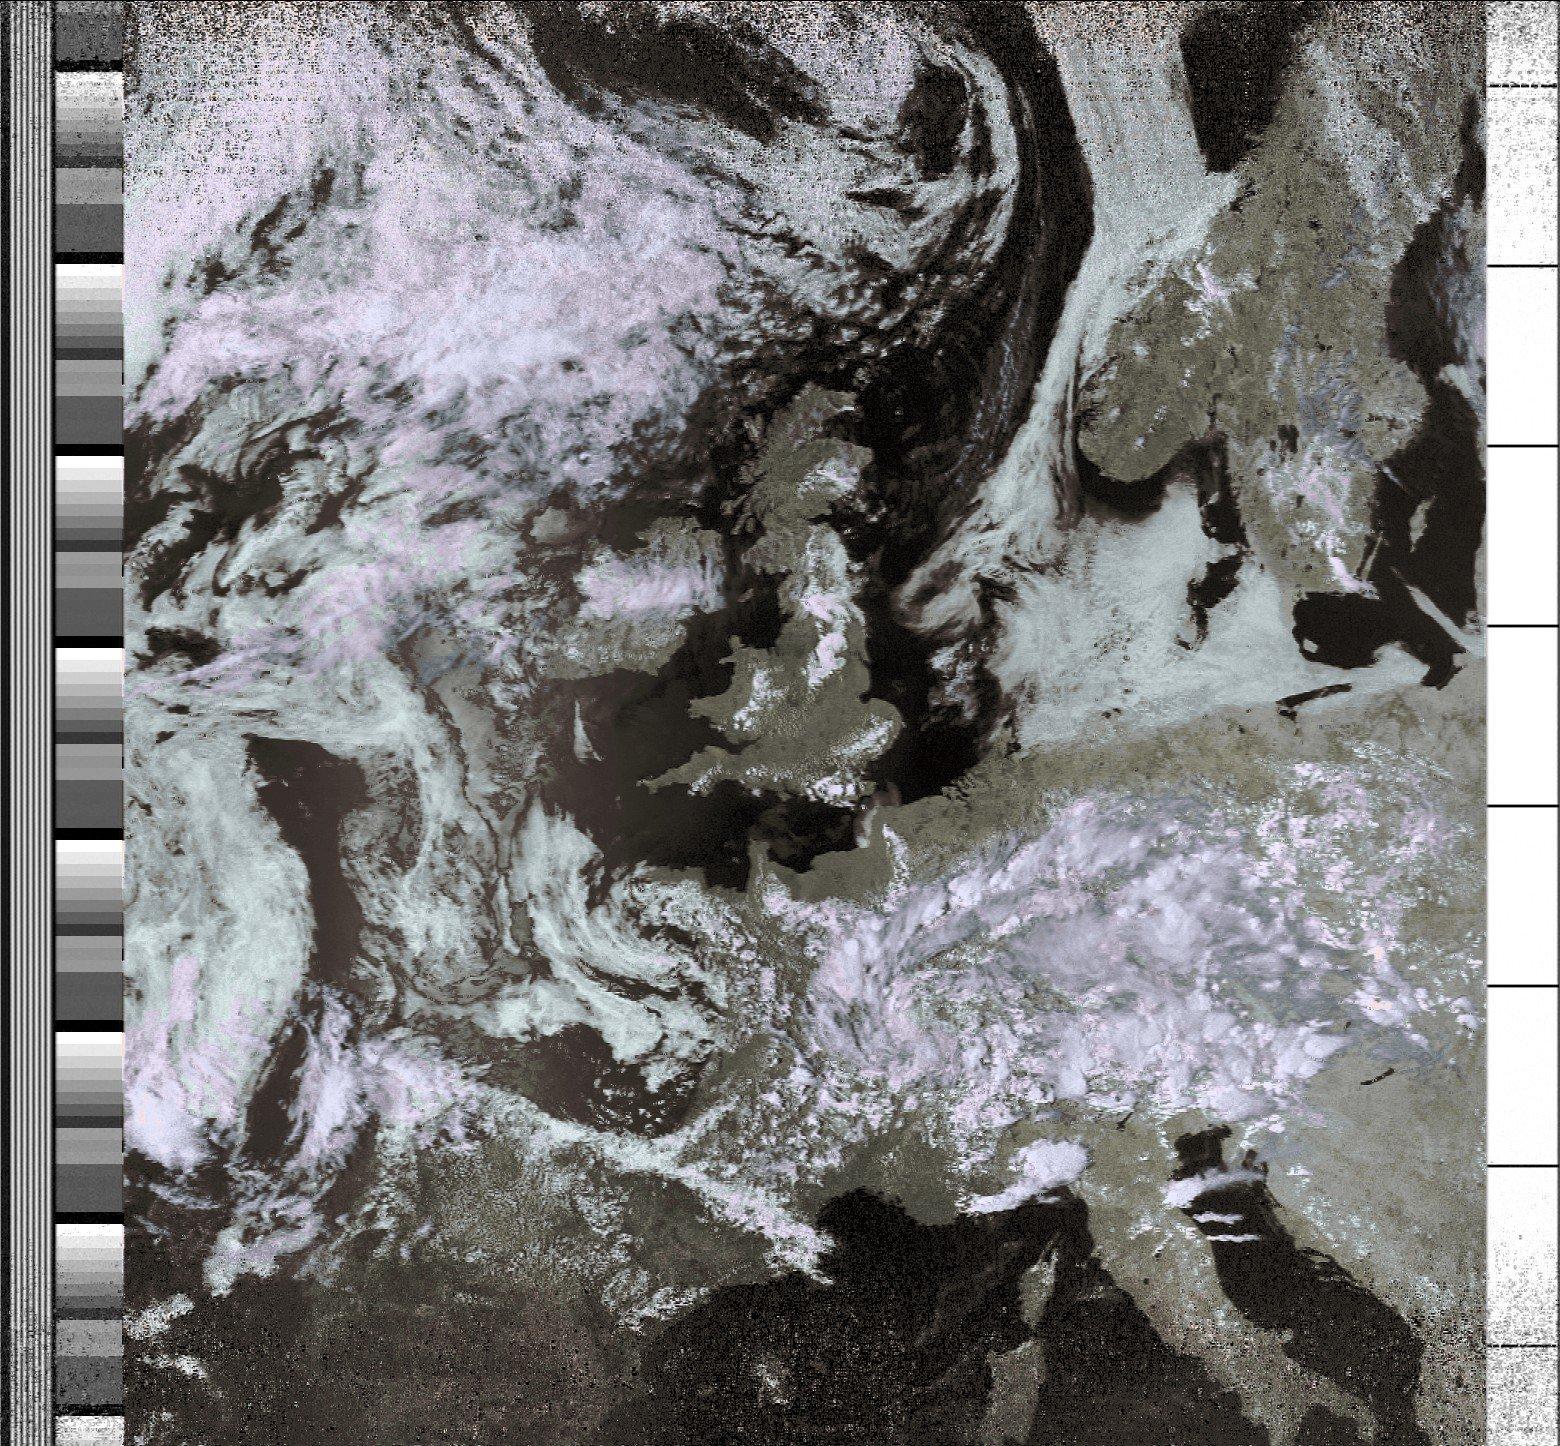 Receiving NOAA weather satellite images